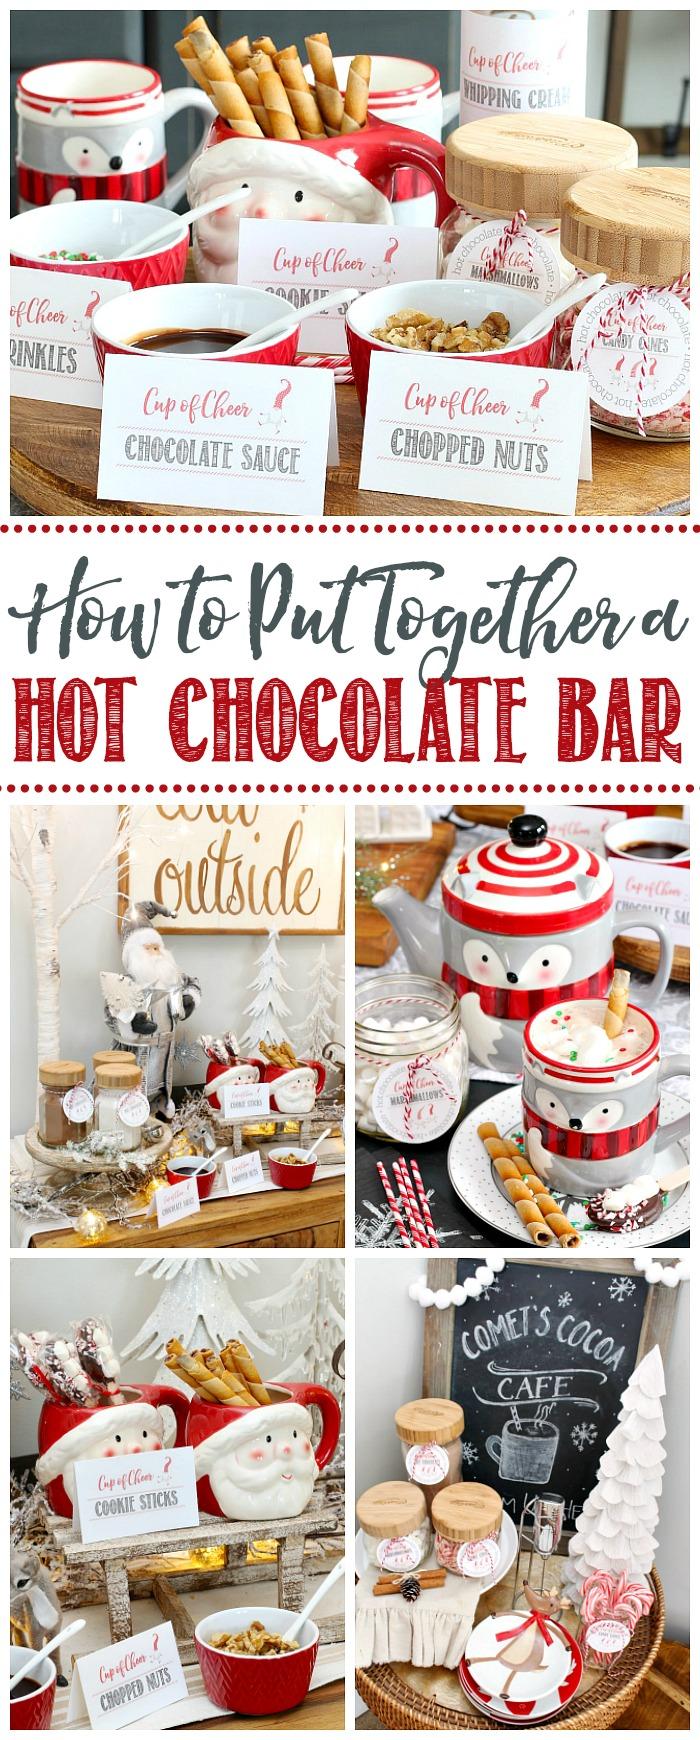 Cute ideas to put together a fun hot chocolate bar.